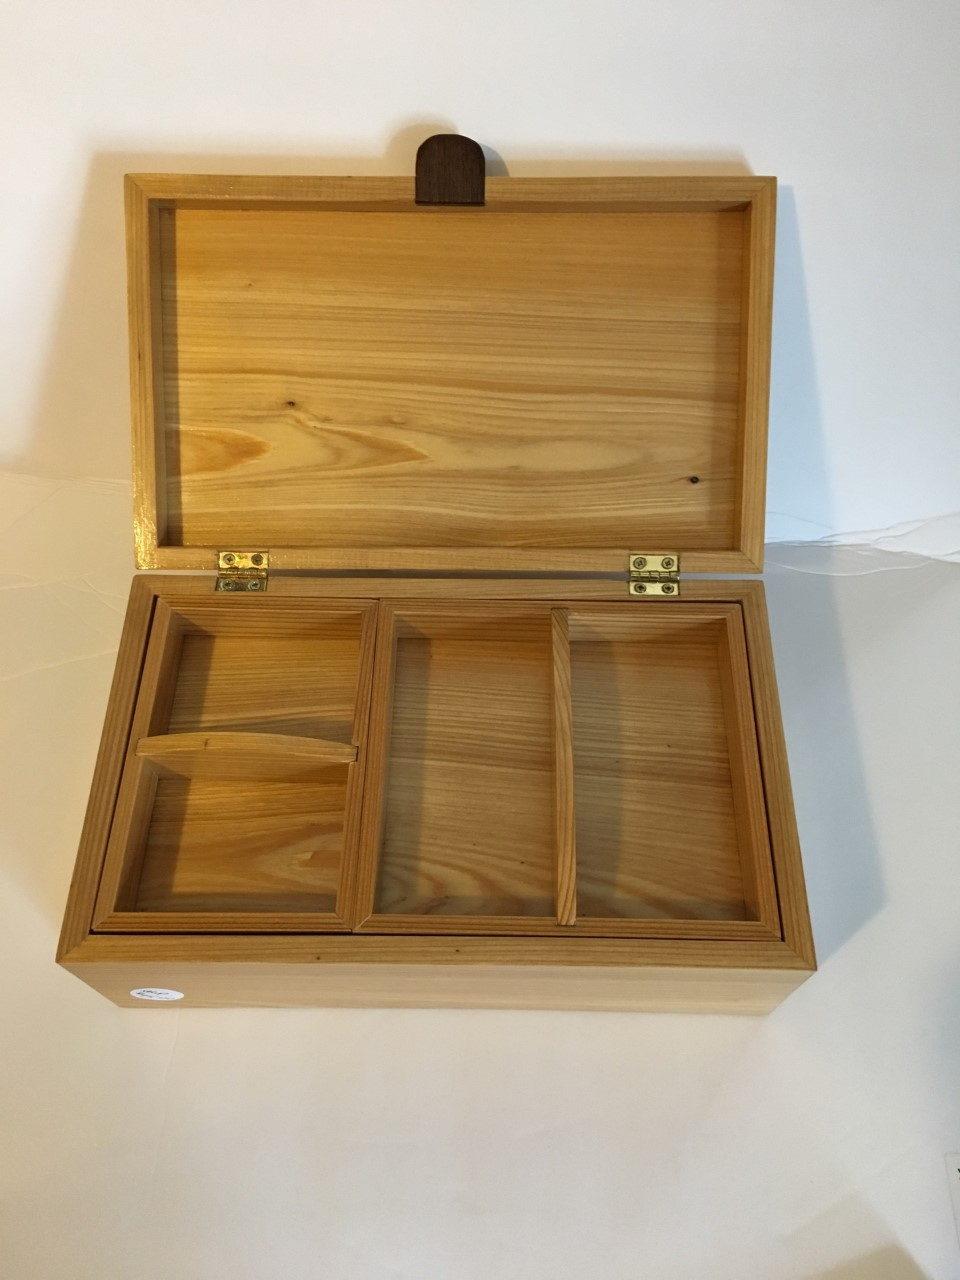 Handcrafted Wooden Keepsake Box